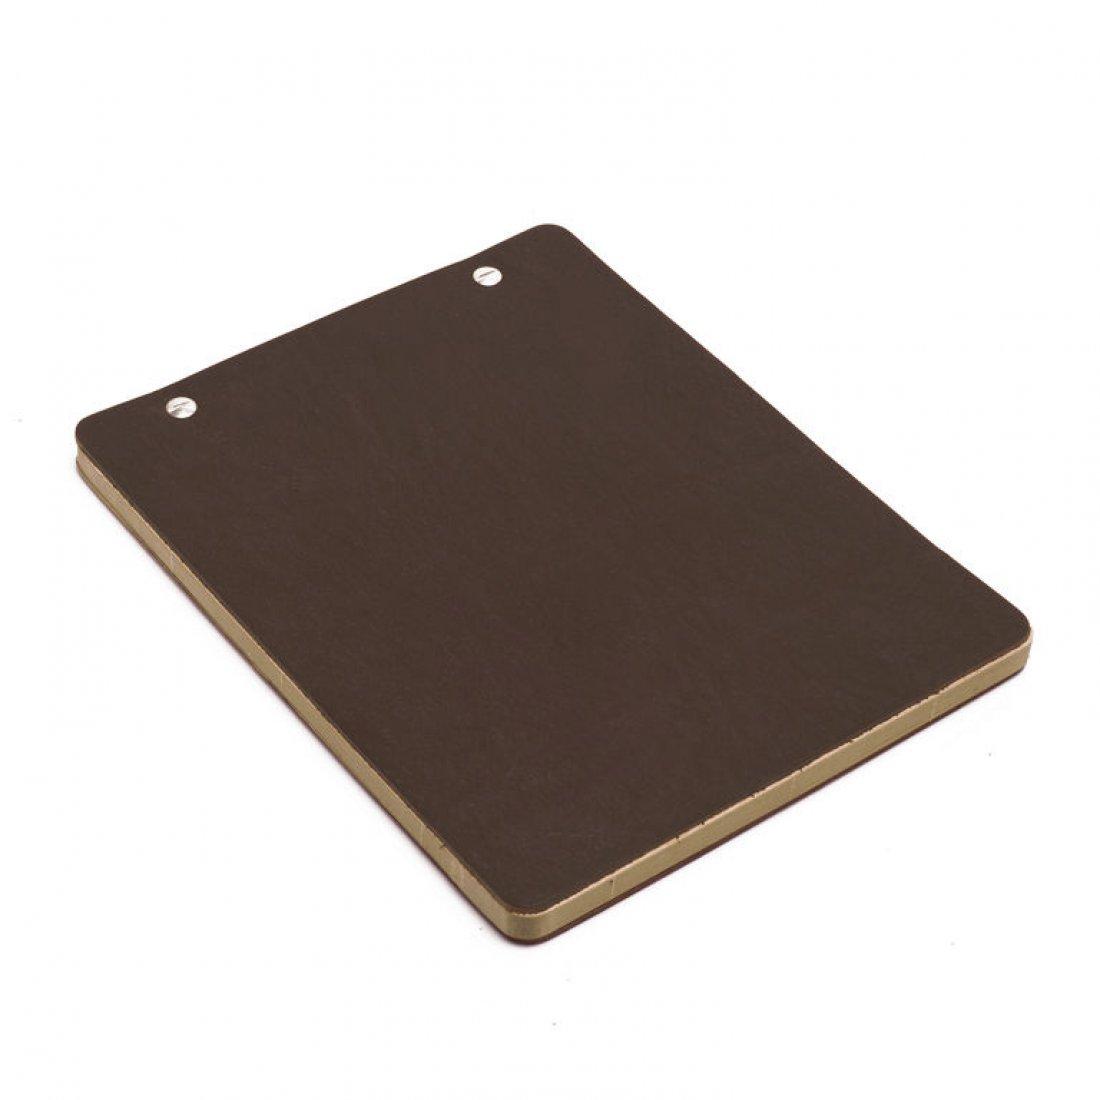 Carnet en cuir iKraft - Perù